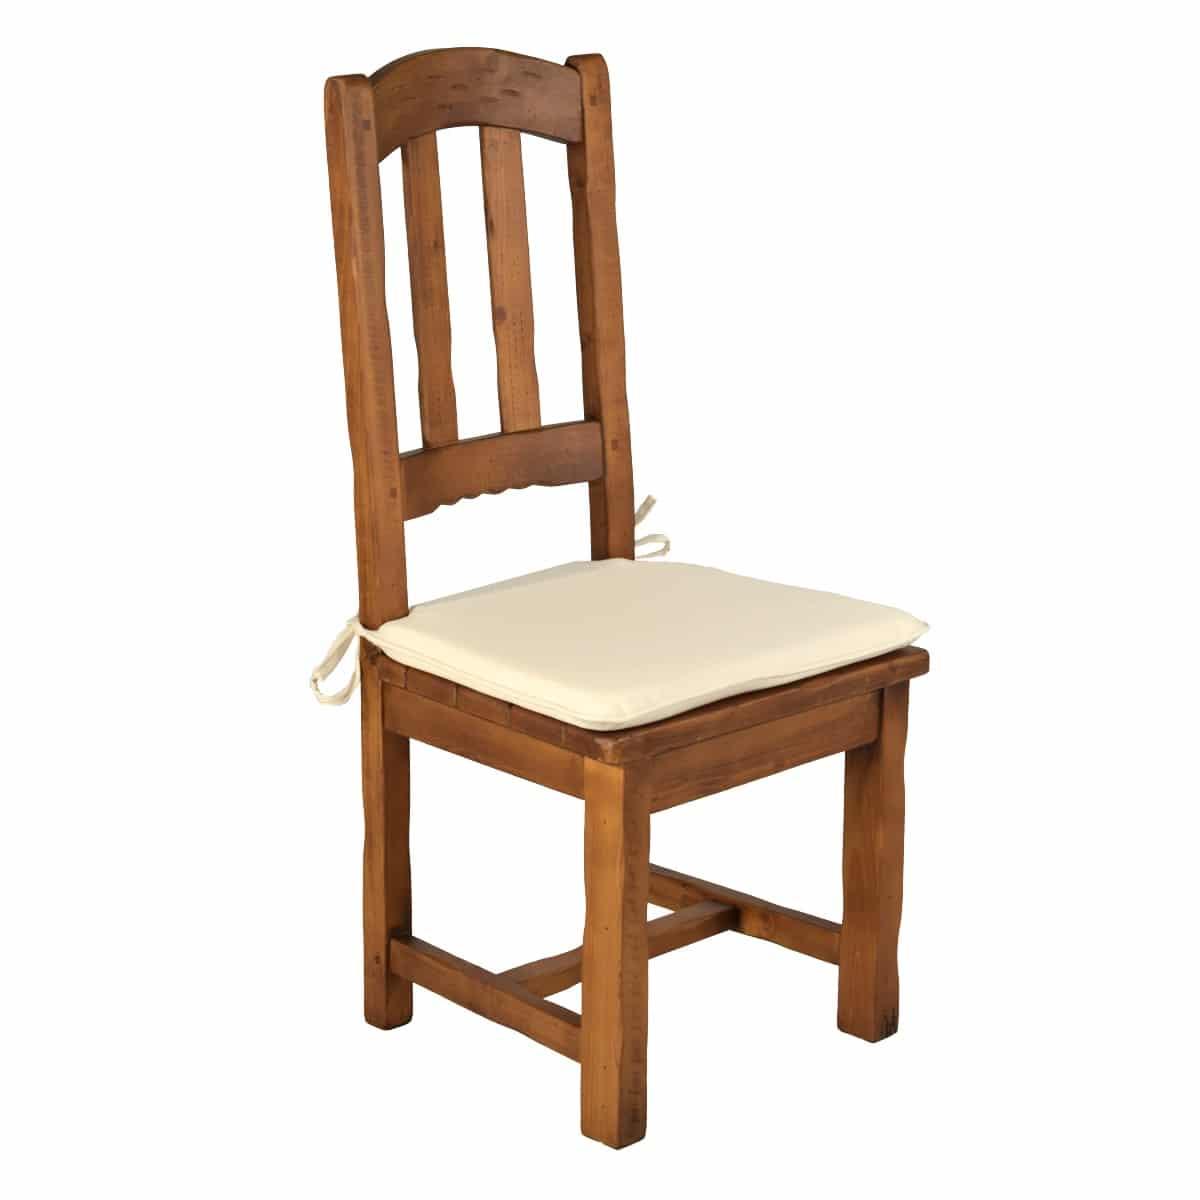 Silla alta r stica asiento de madera ecor stico venta de for Sillas de madera para salon